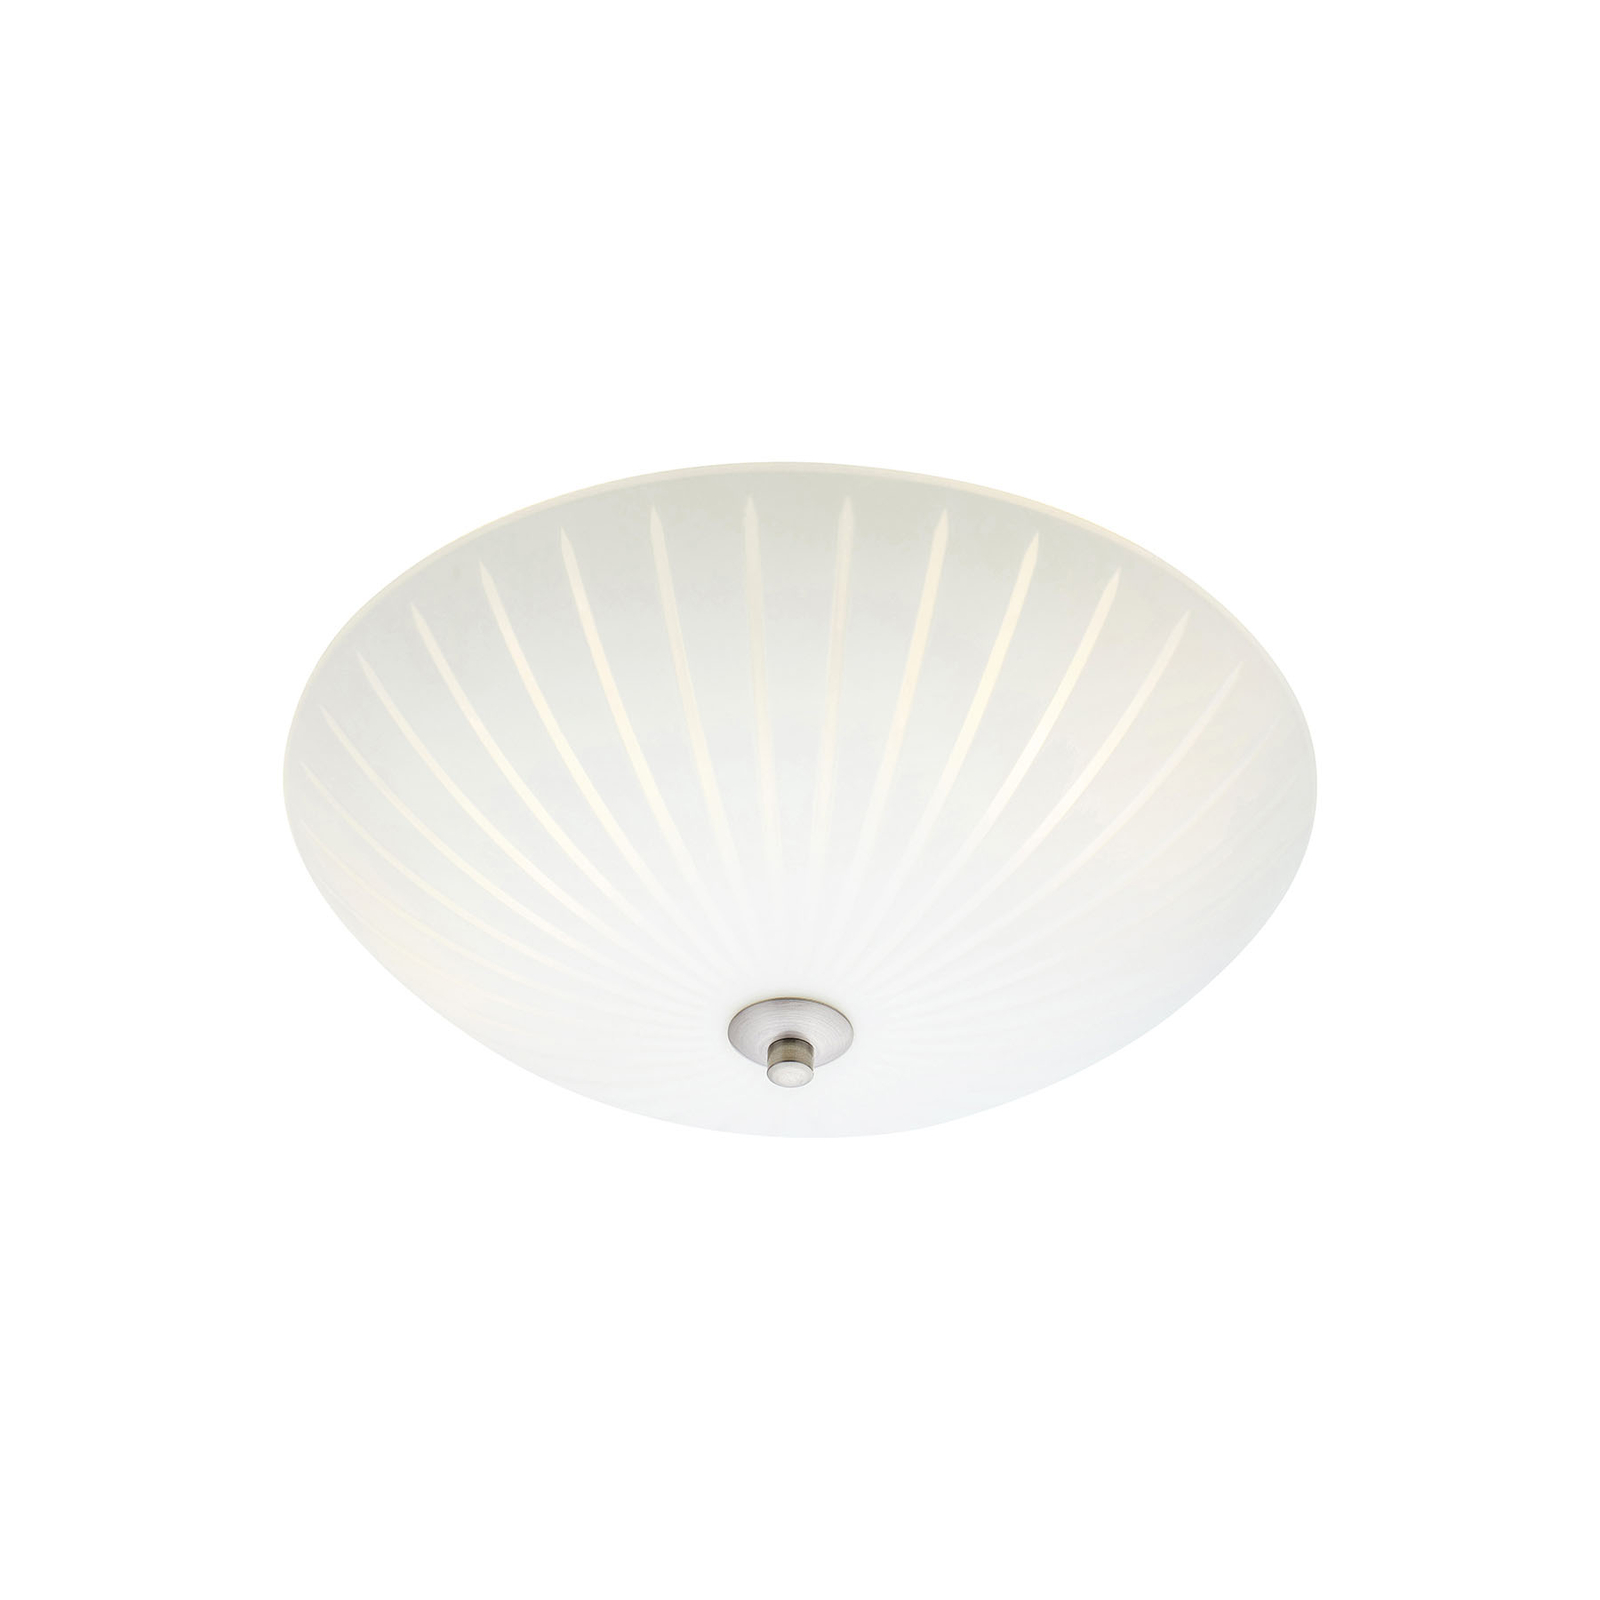 Kattovalaisin Cut lasia, Ø 35 cm